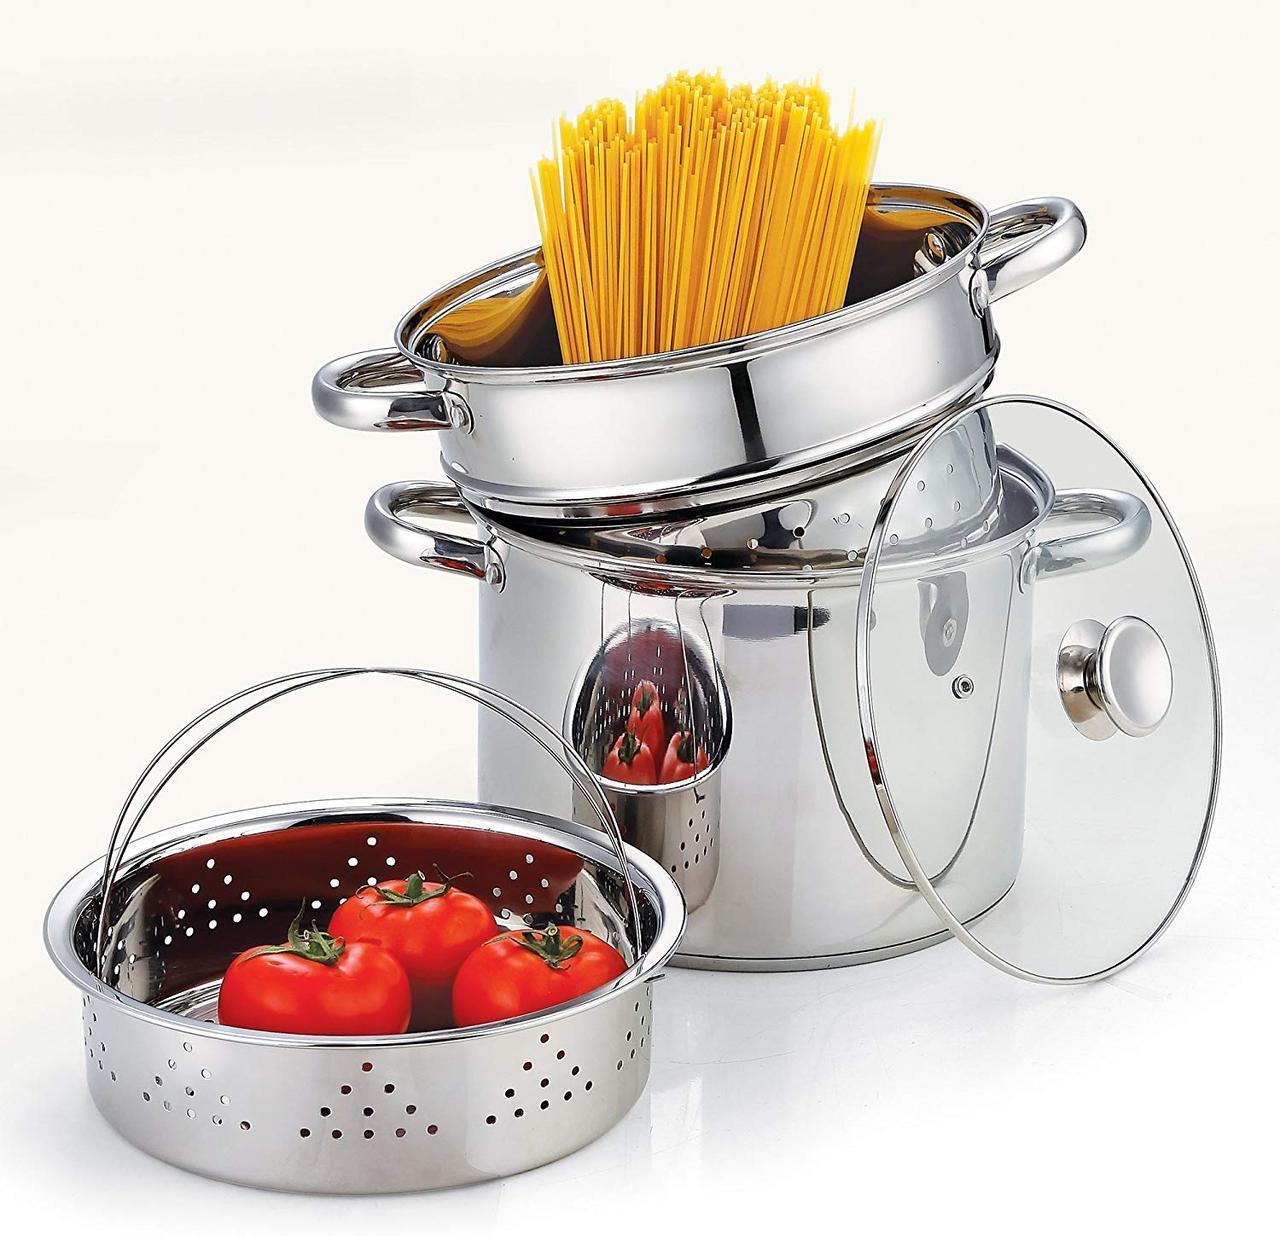 Набор Кухонной посуды Zurrichberg ZBP 7016, 4 предмета